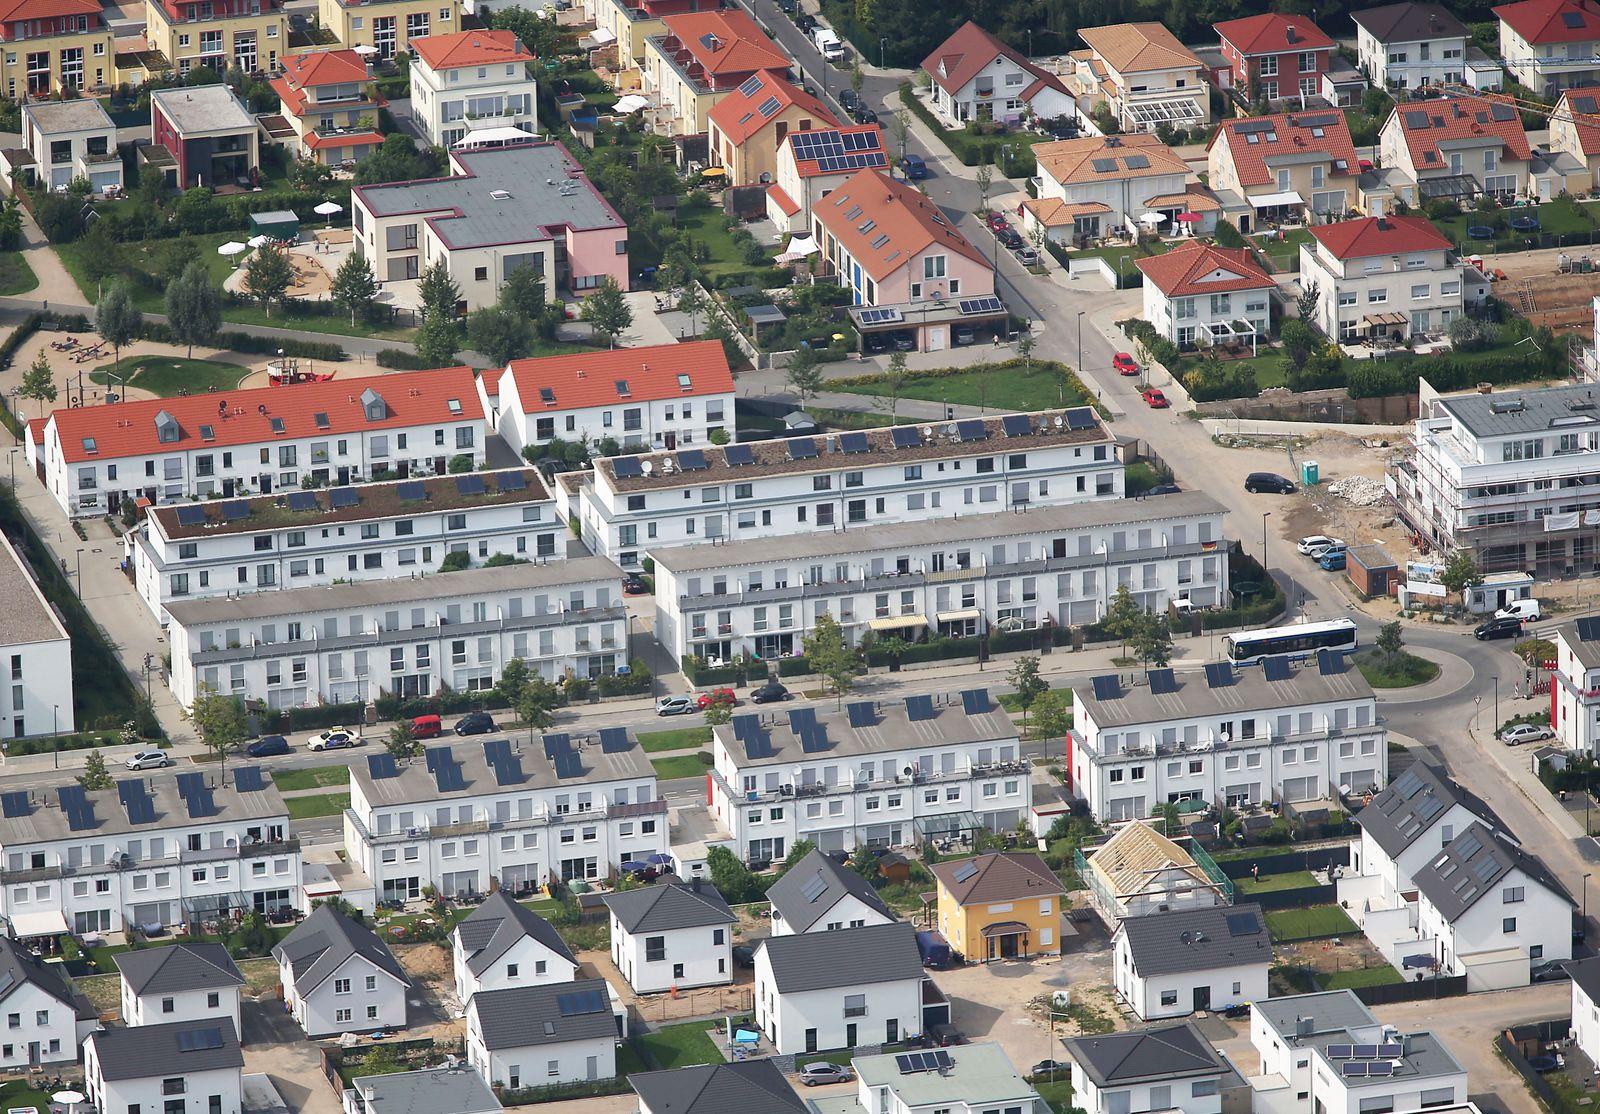 Neubausiedlung / Immobilien / Wohnhäuser